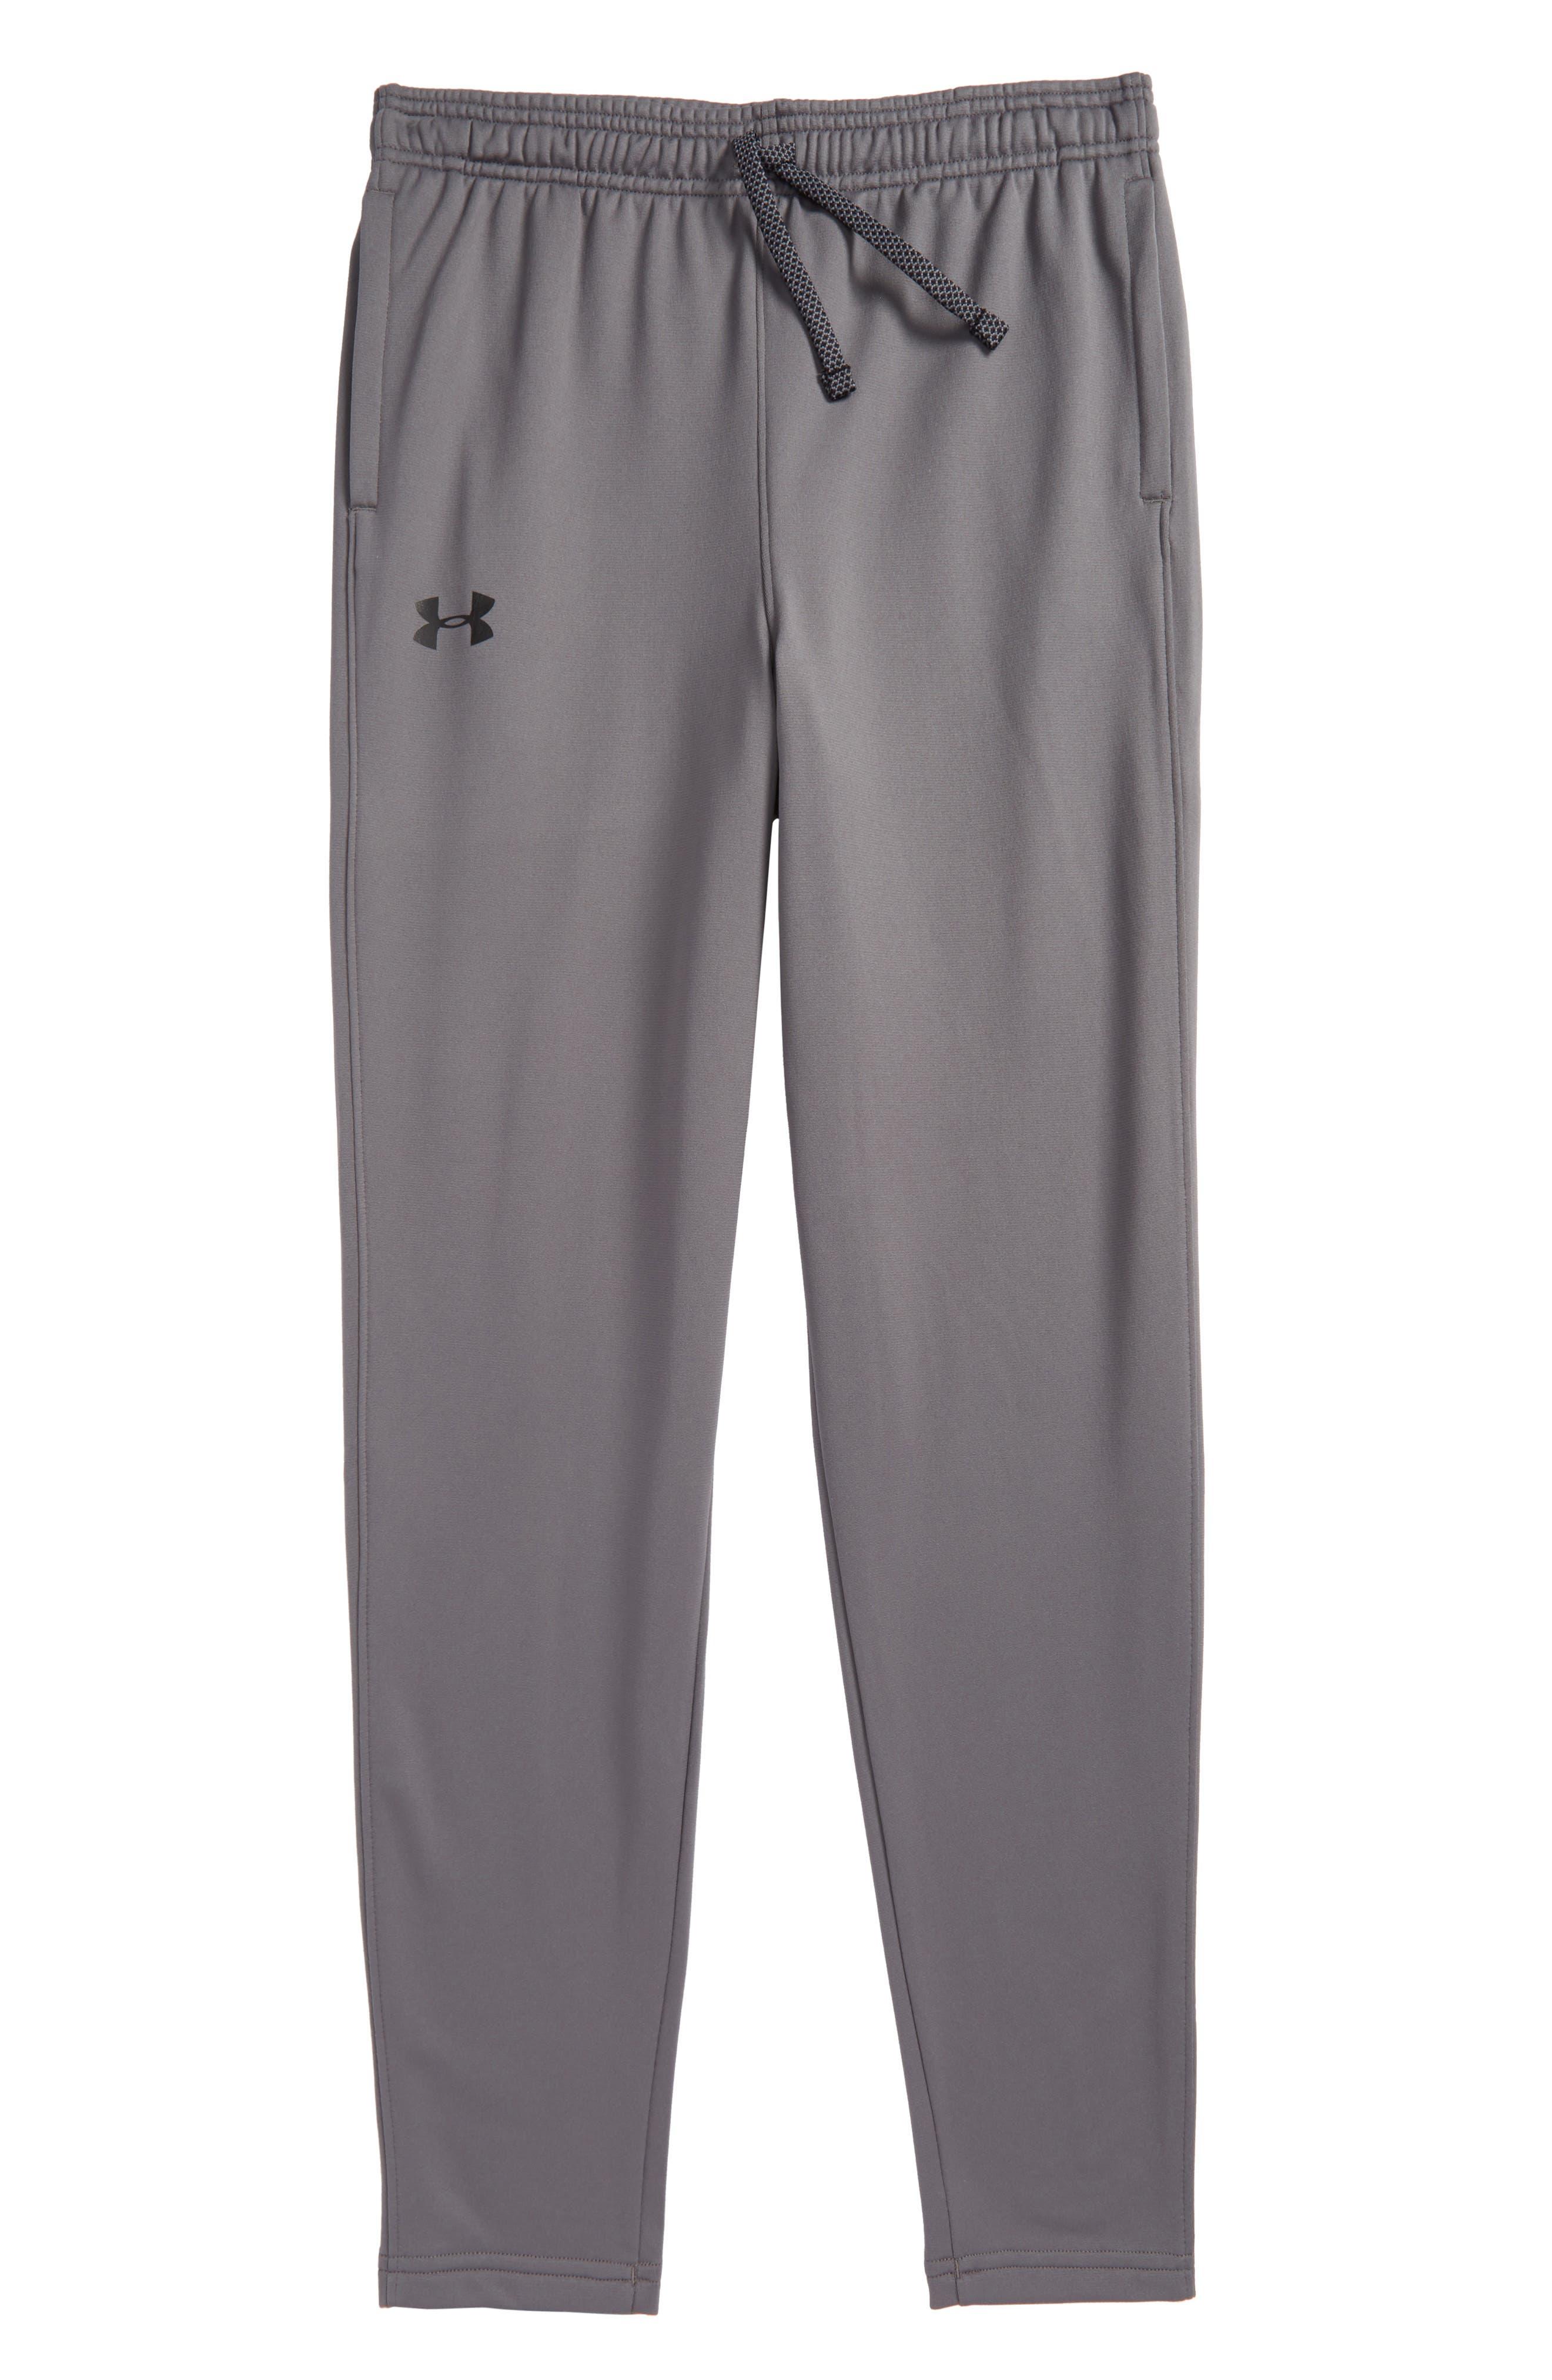 Brawler Tapered Sweatpants,                         Main,                         color, Graphite/ Black